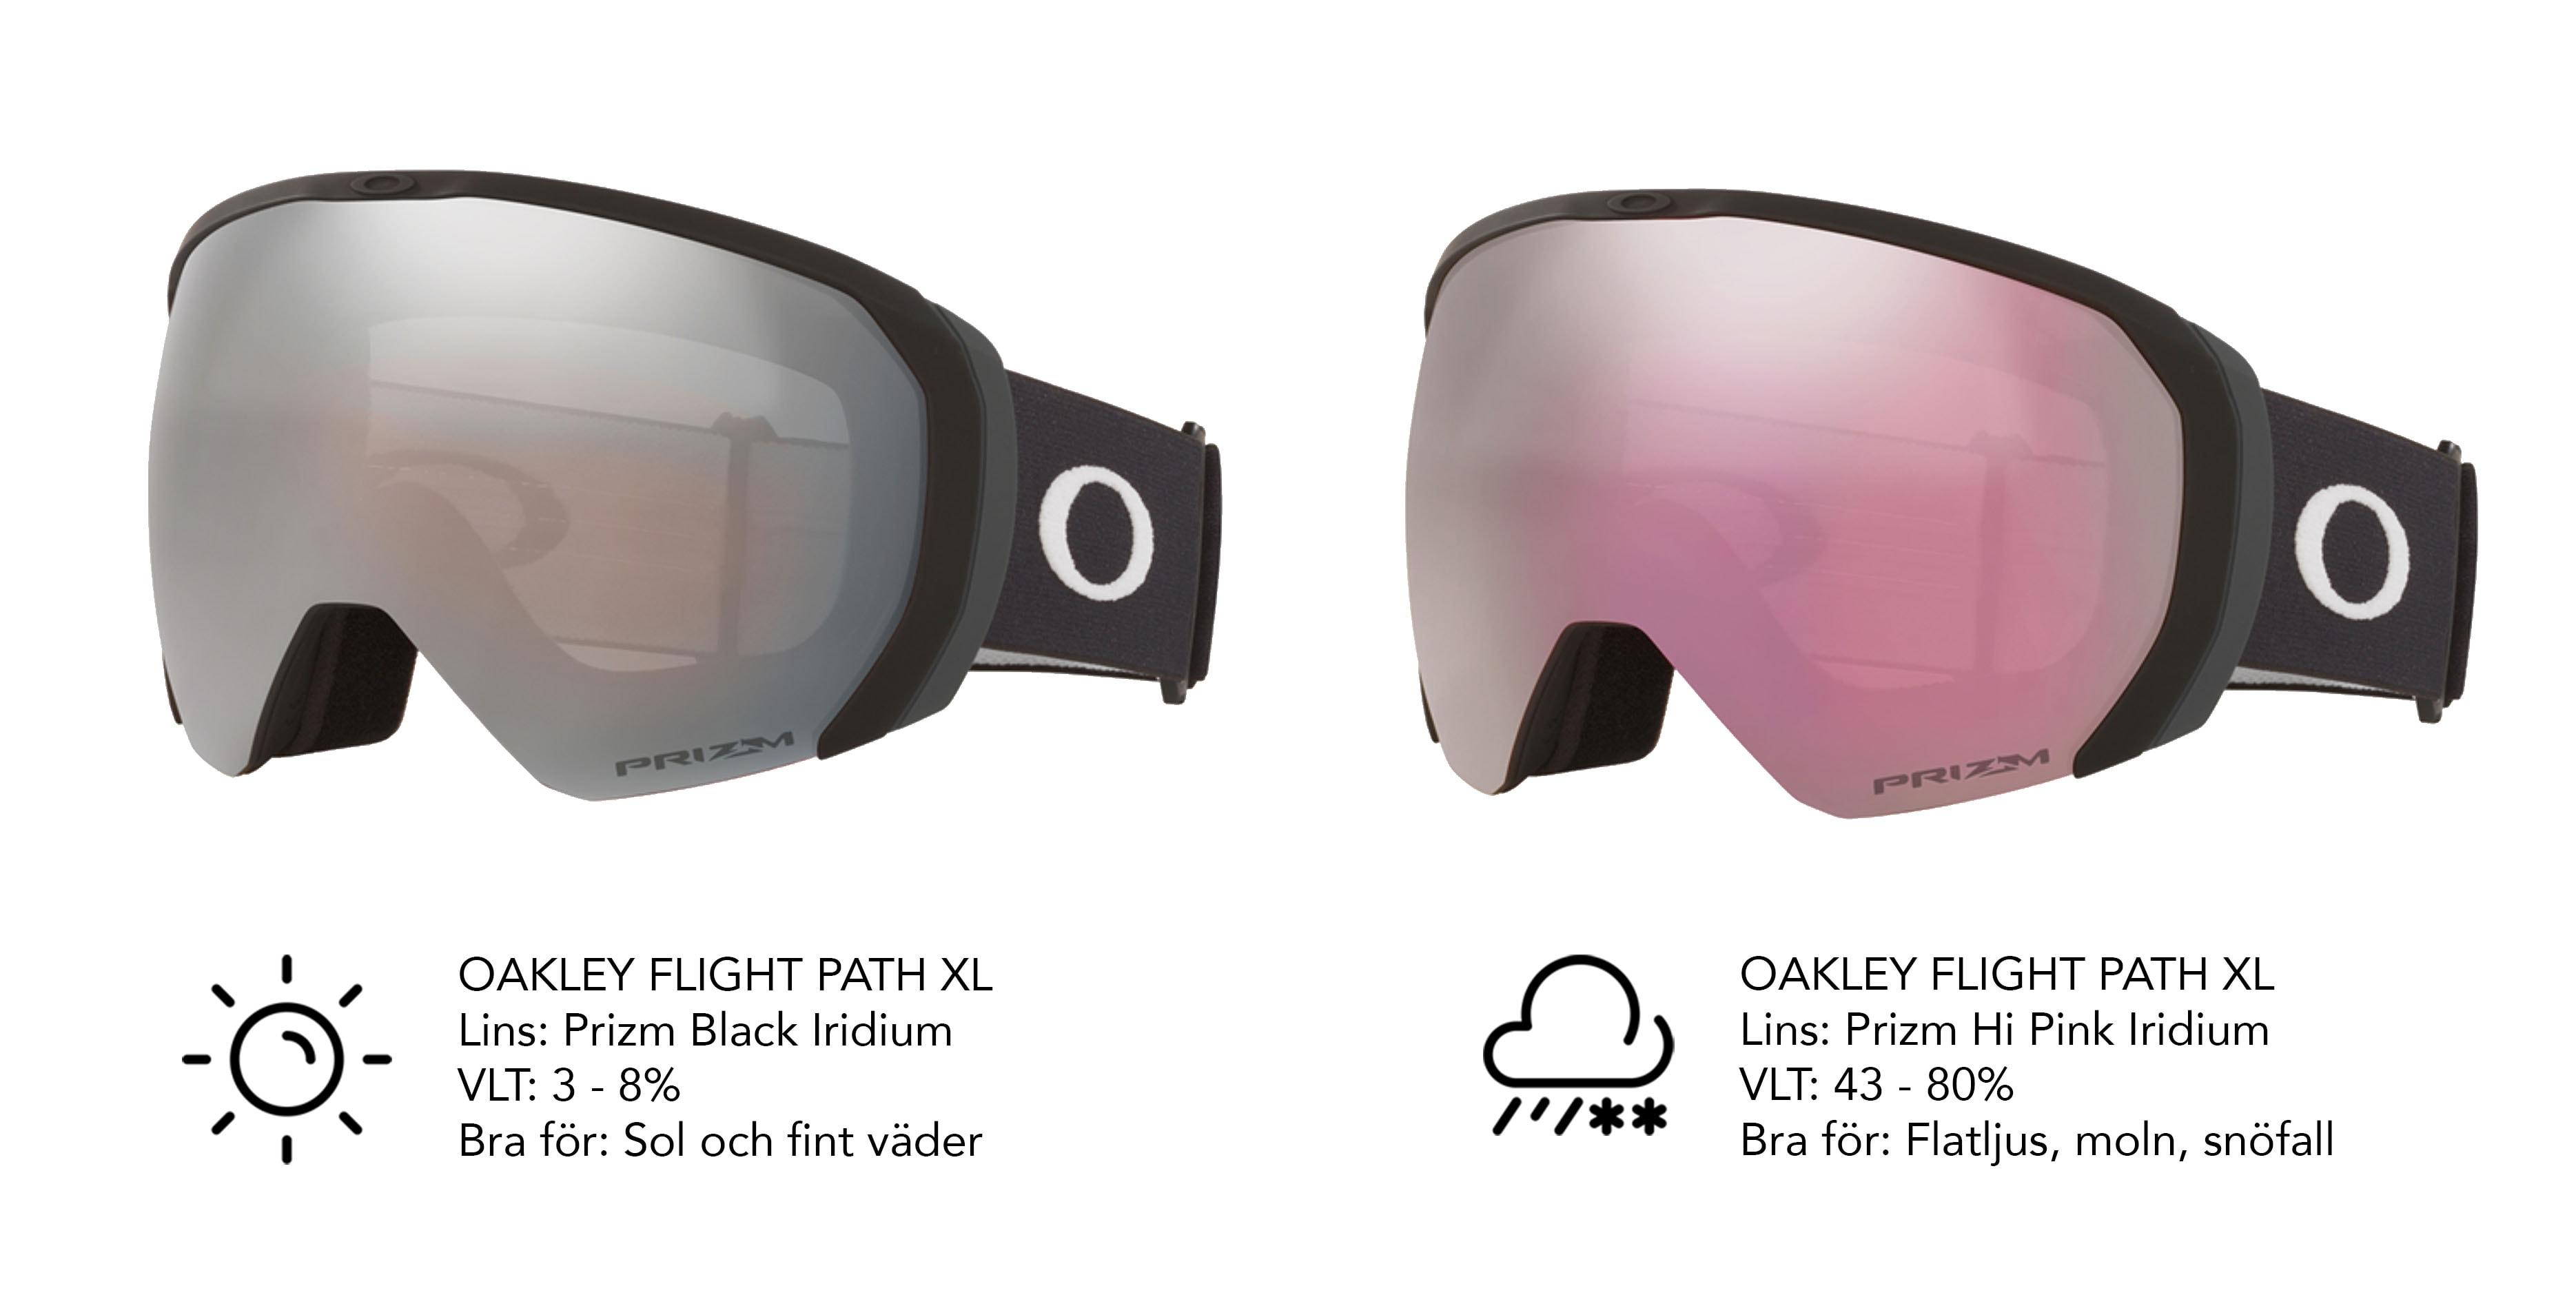 Oakley goggles alpingaraget